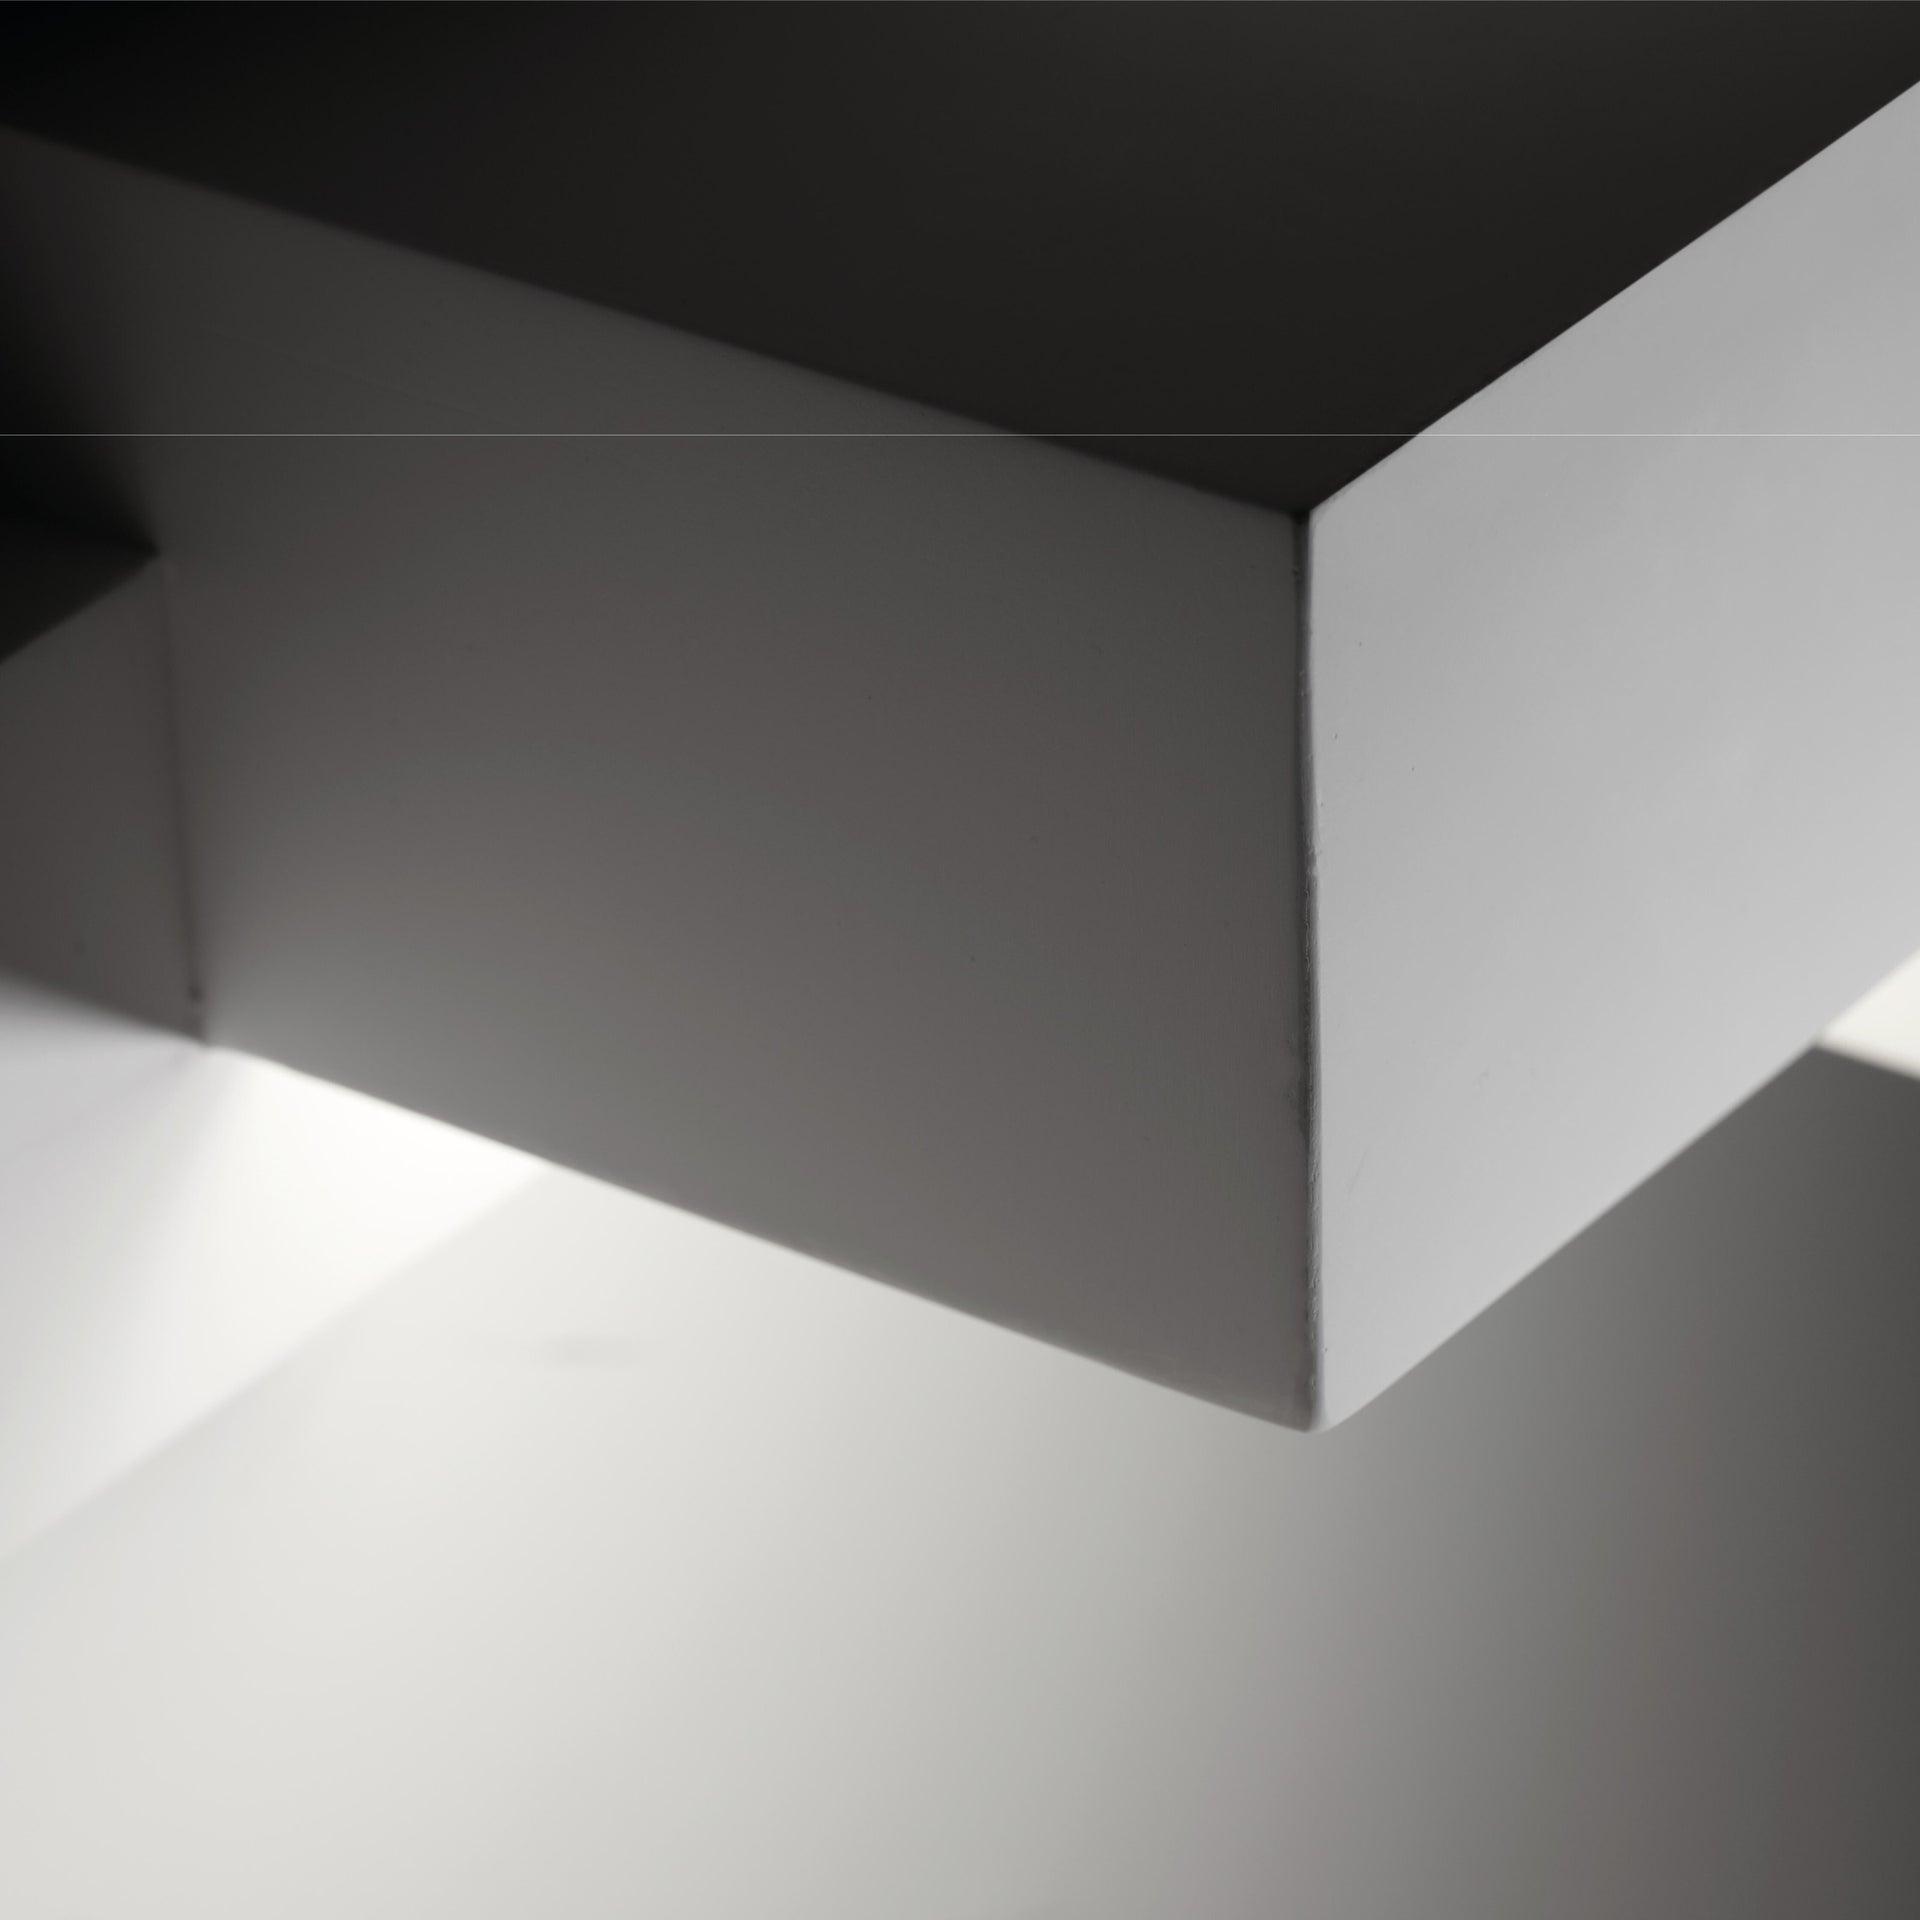 Applique SIDE SMALL bianco, in gesso, 2 luci - 10